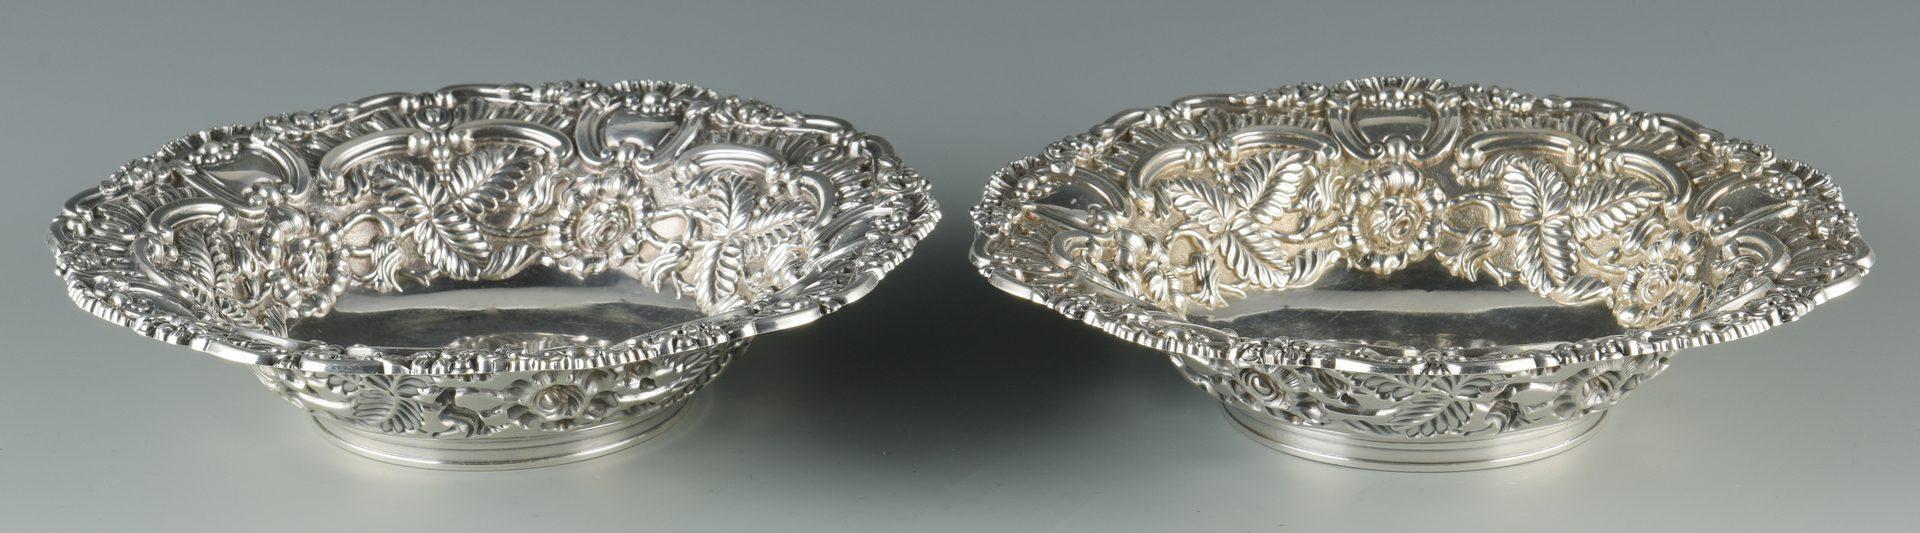 Lot 734: 2 Geo. IV Repousse silver bowls